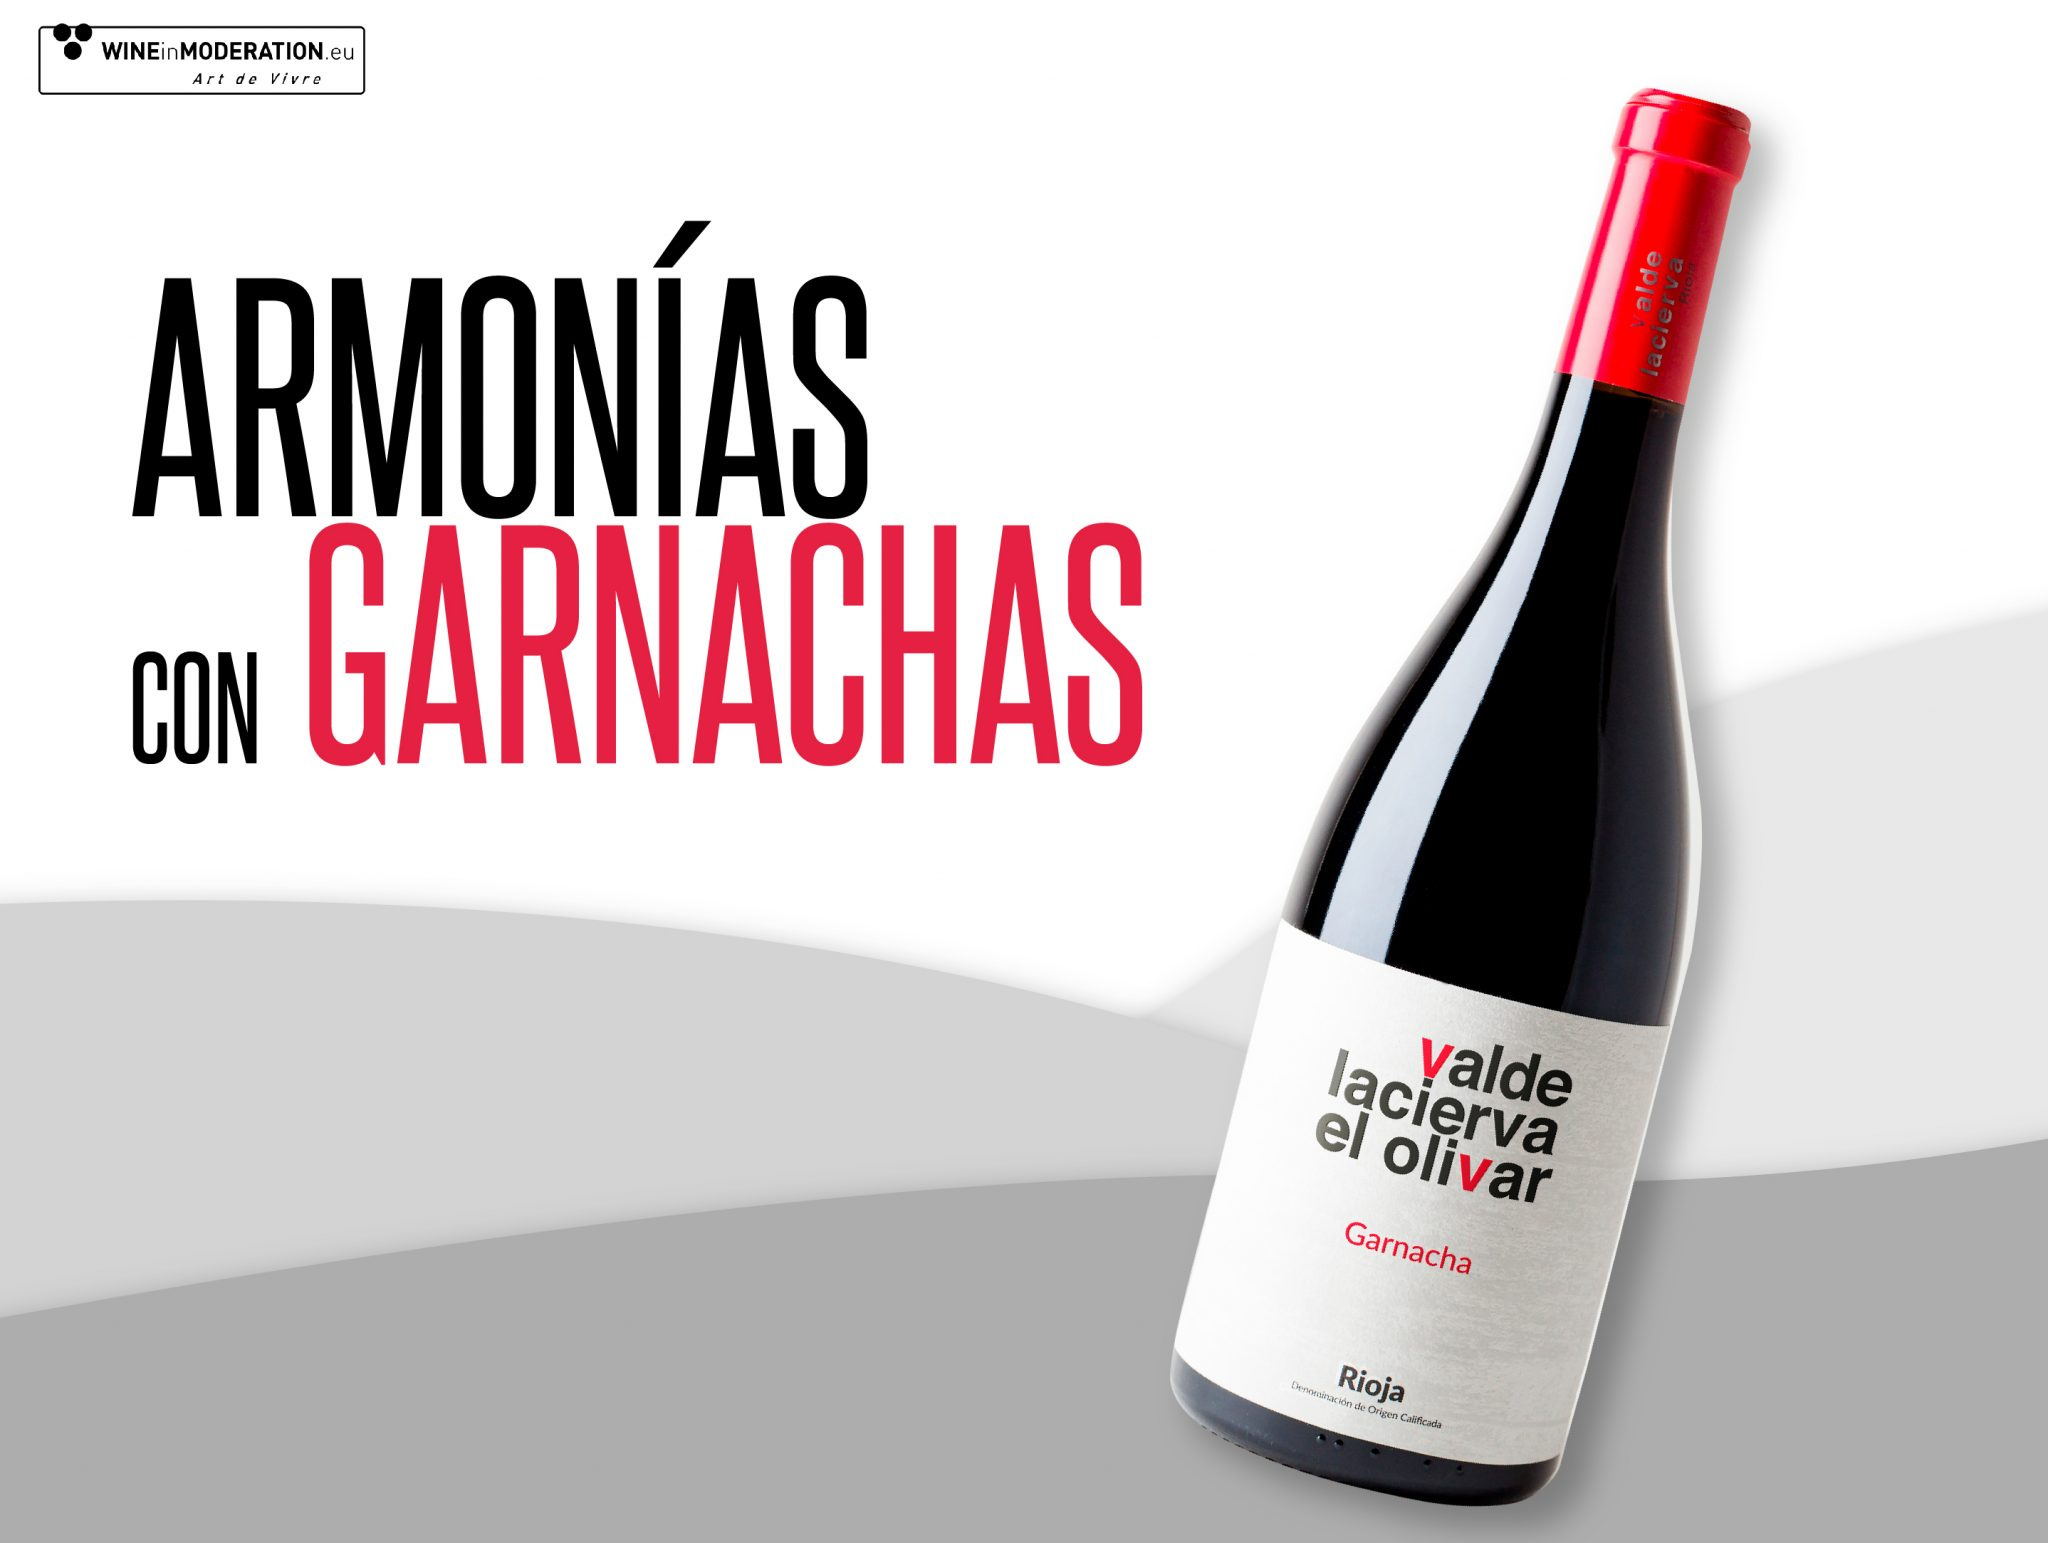 Valdelacierva Garnacha celebra a la mujer